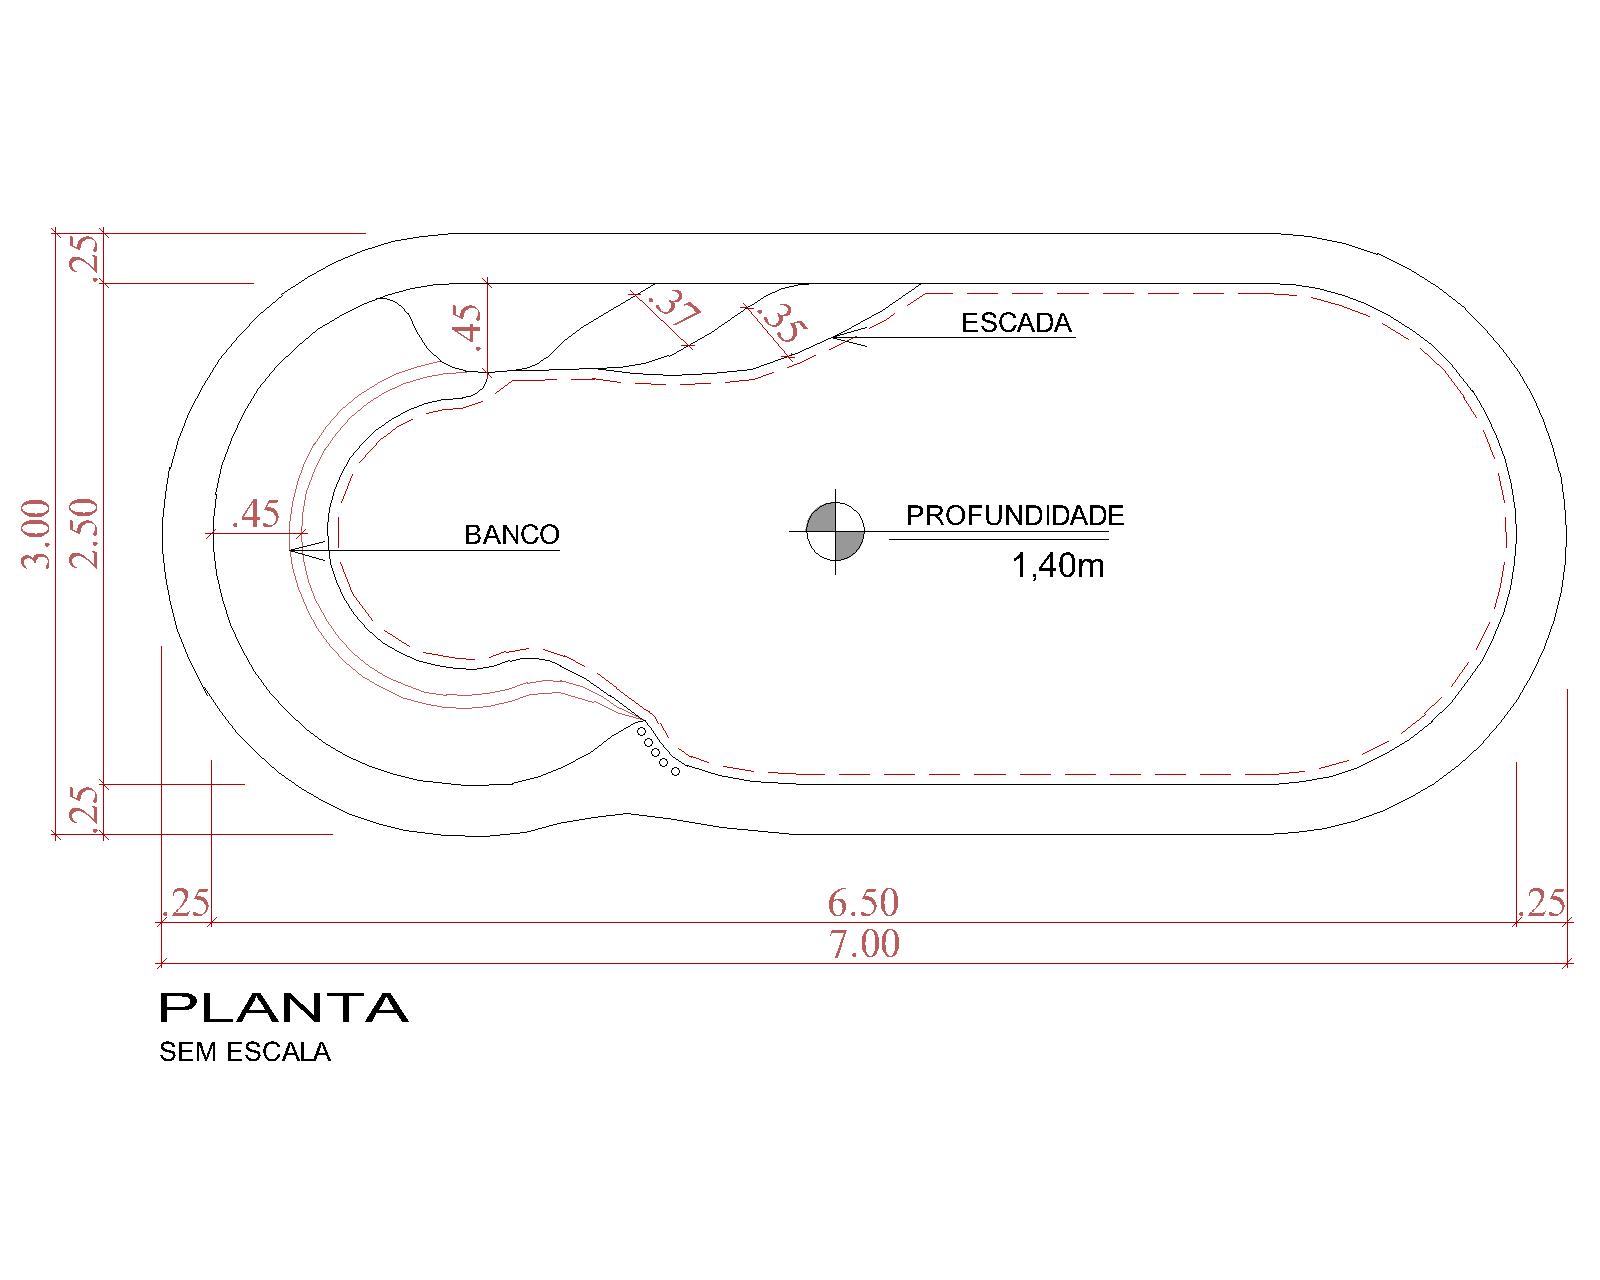 Dibujos técnicos Salinas (sin escala)